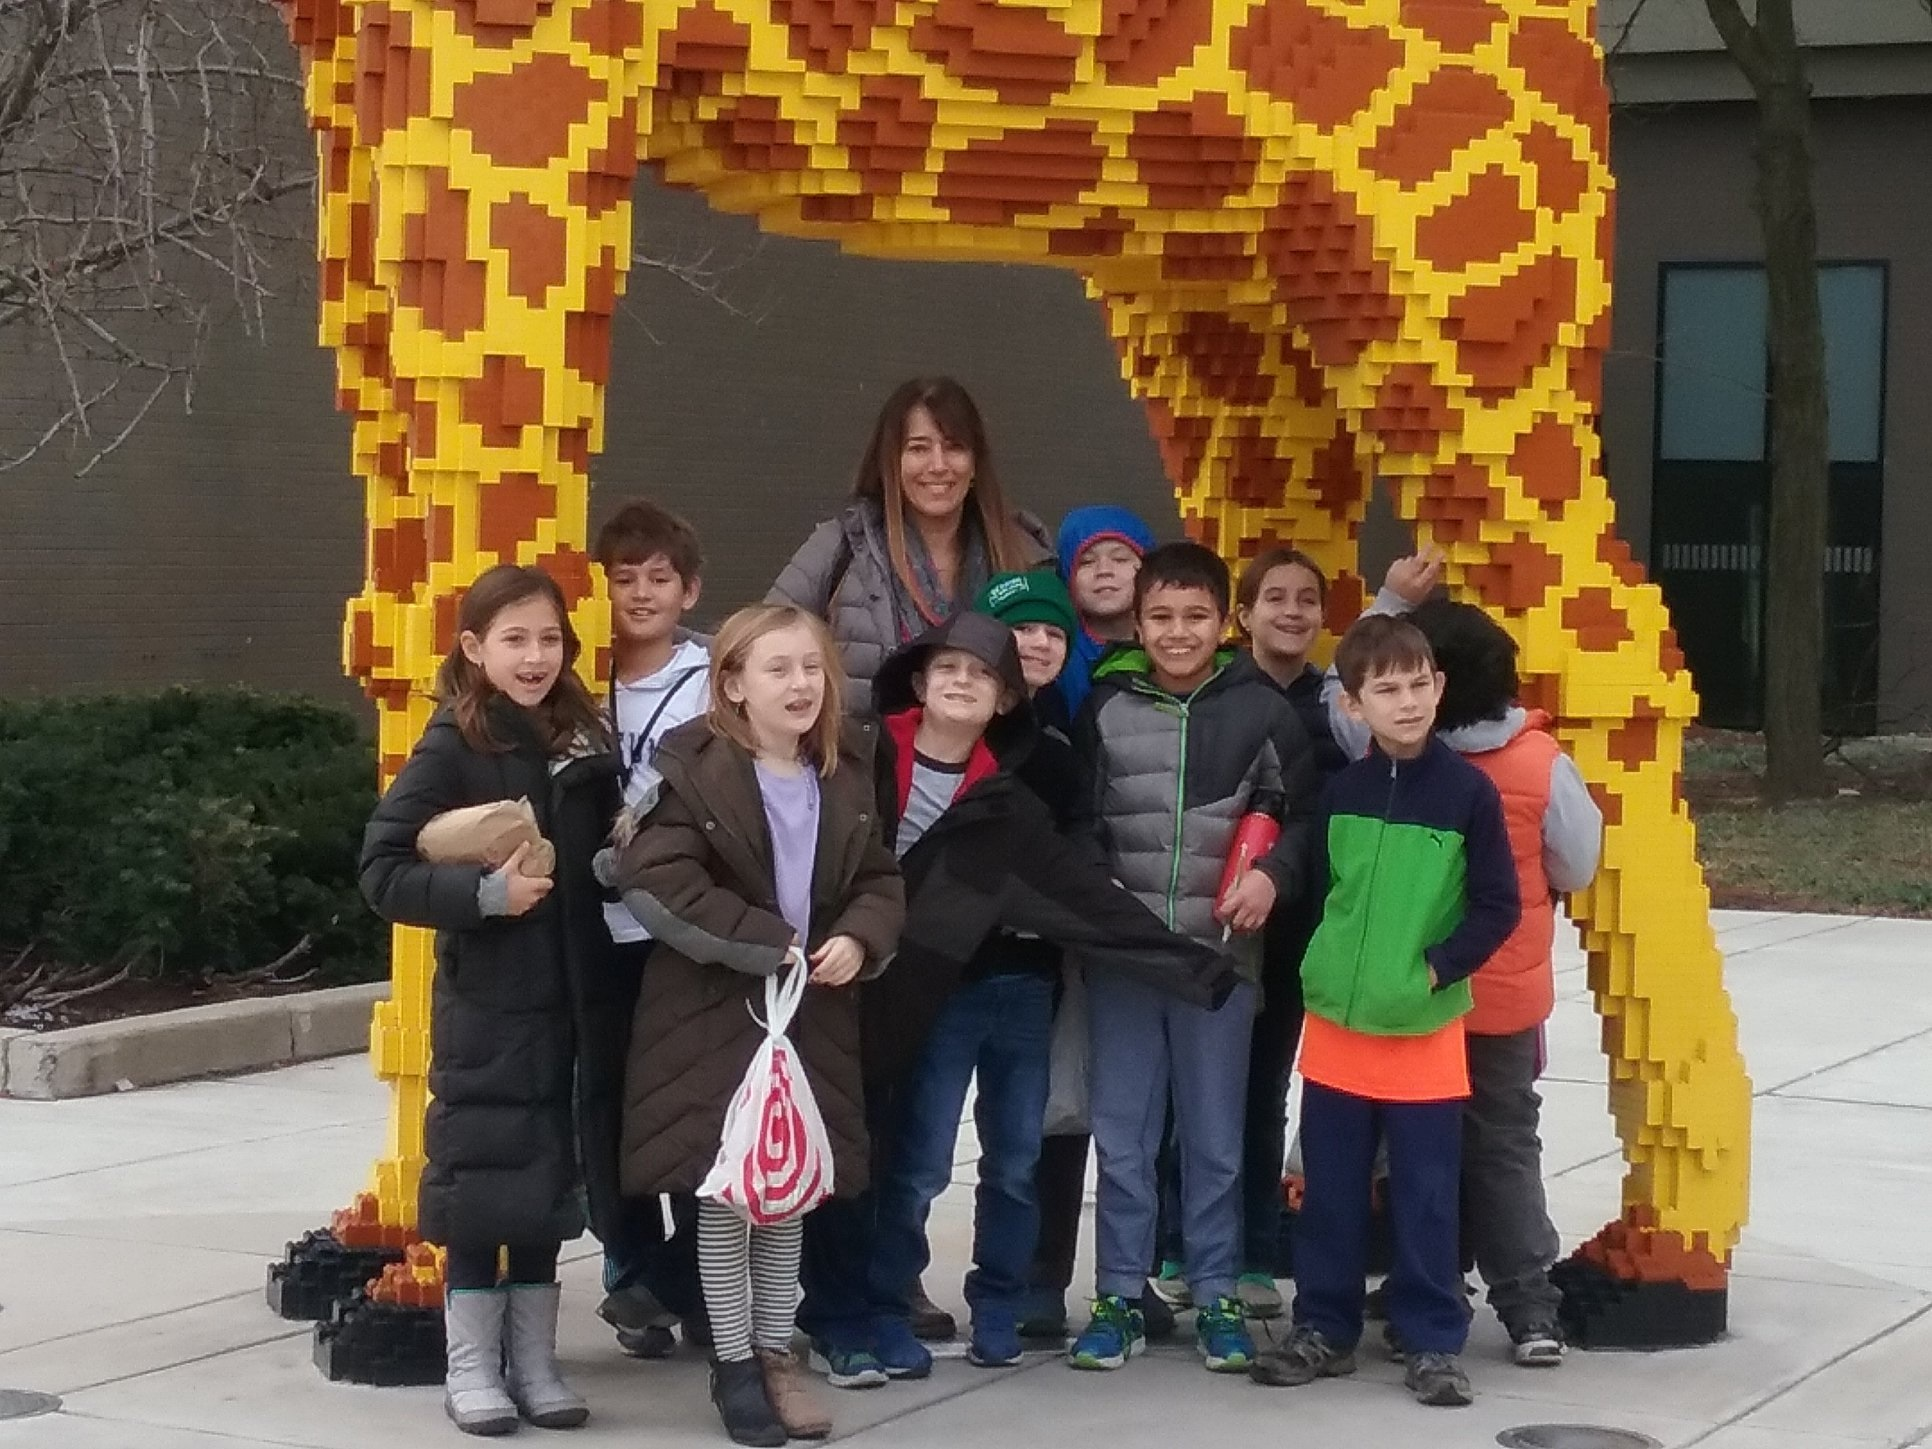 Glenside Local: Abington Students Winners At Legoland